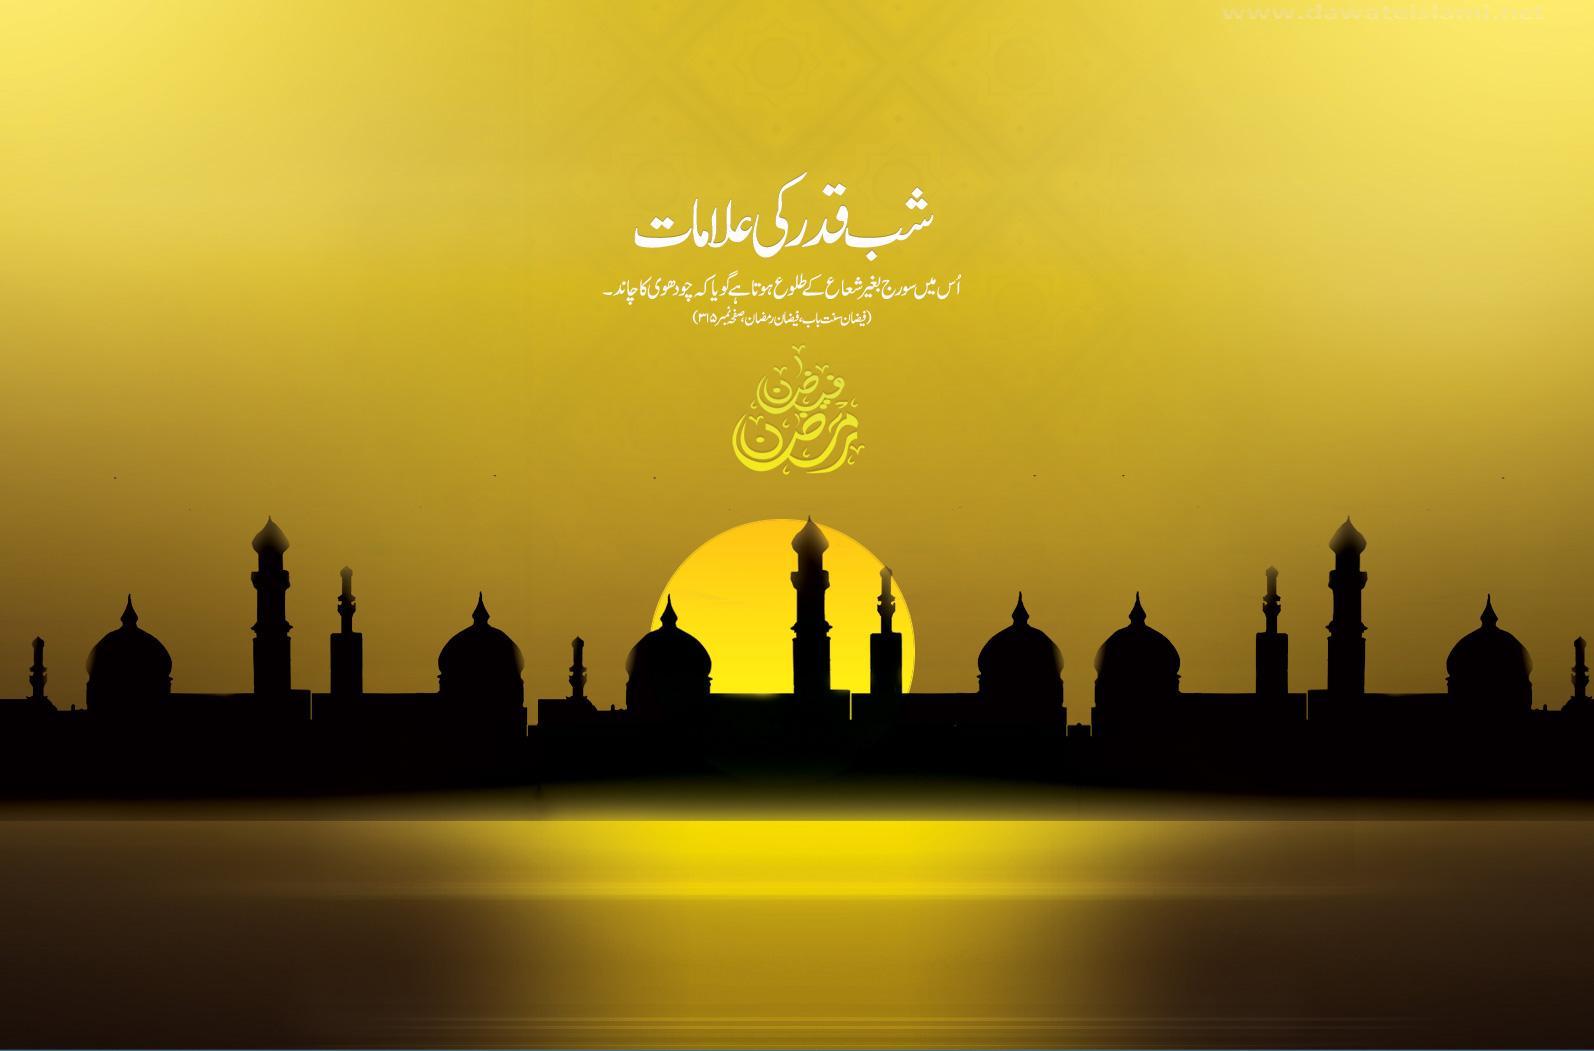 ramadan-hd-image-wallpaper-quran-urdu